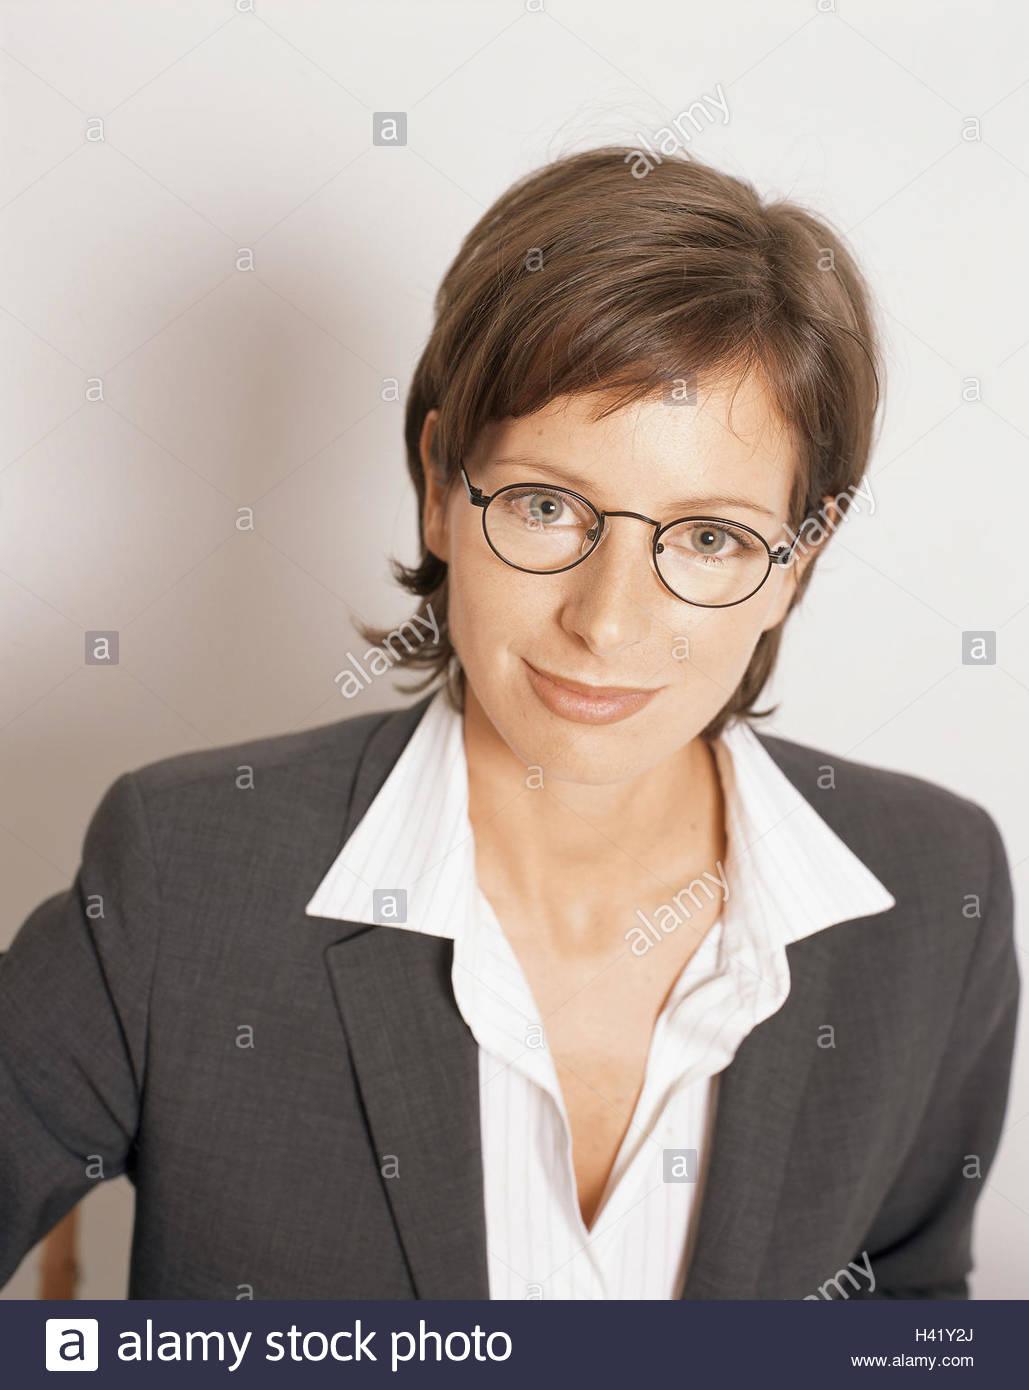 Geschäftsfrau Brille Lächeln Porträt Frauen Porträt 20 30